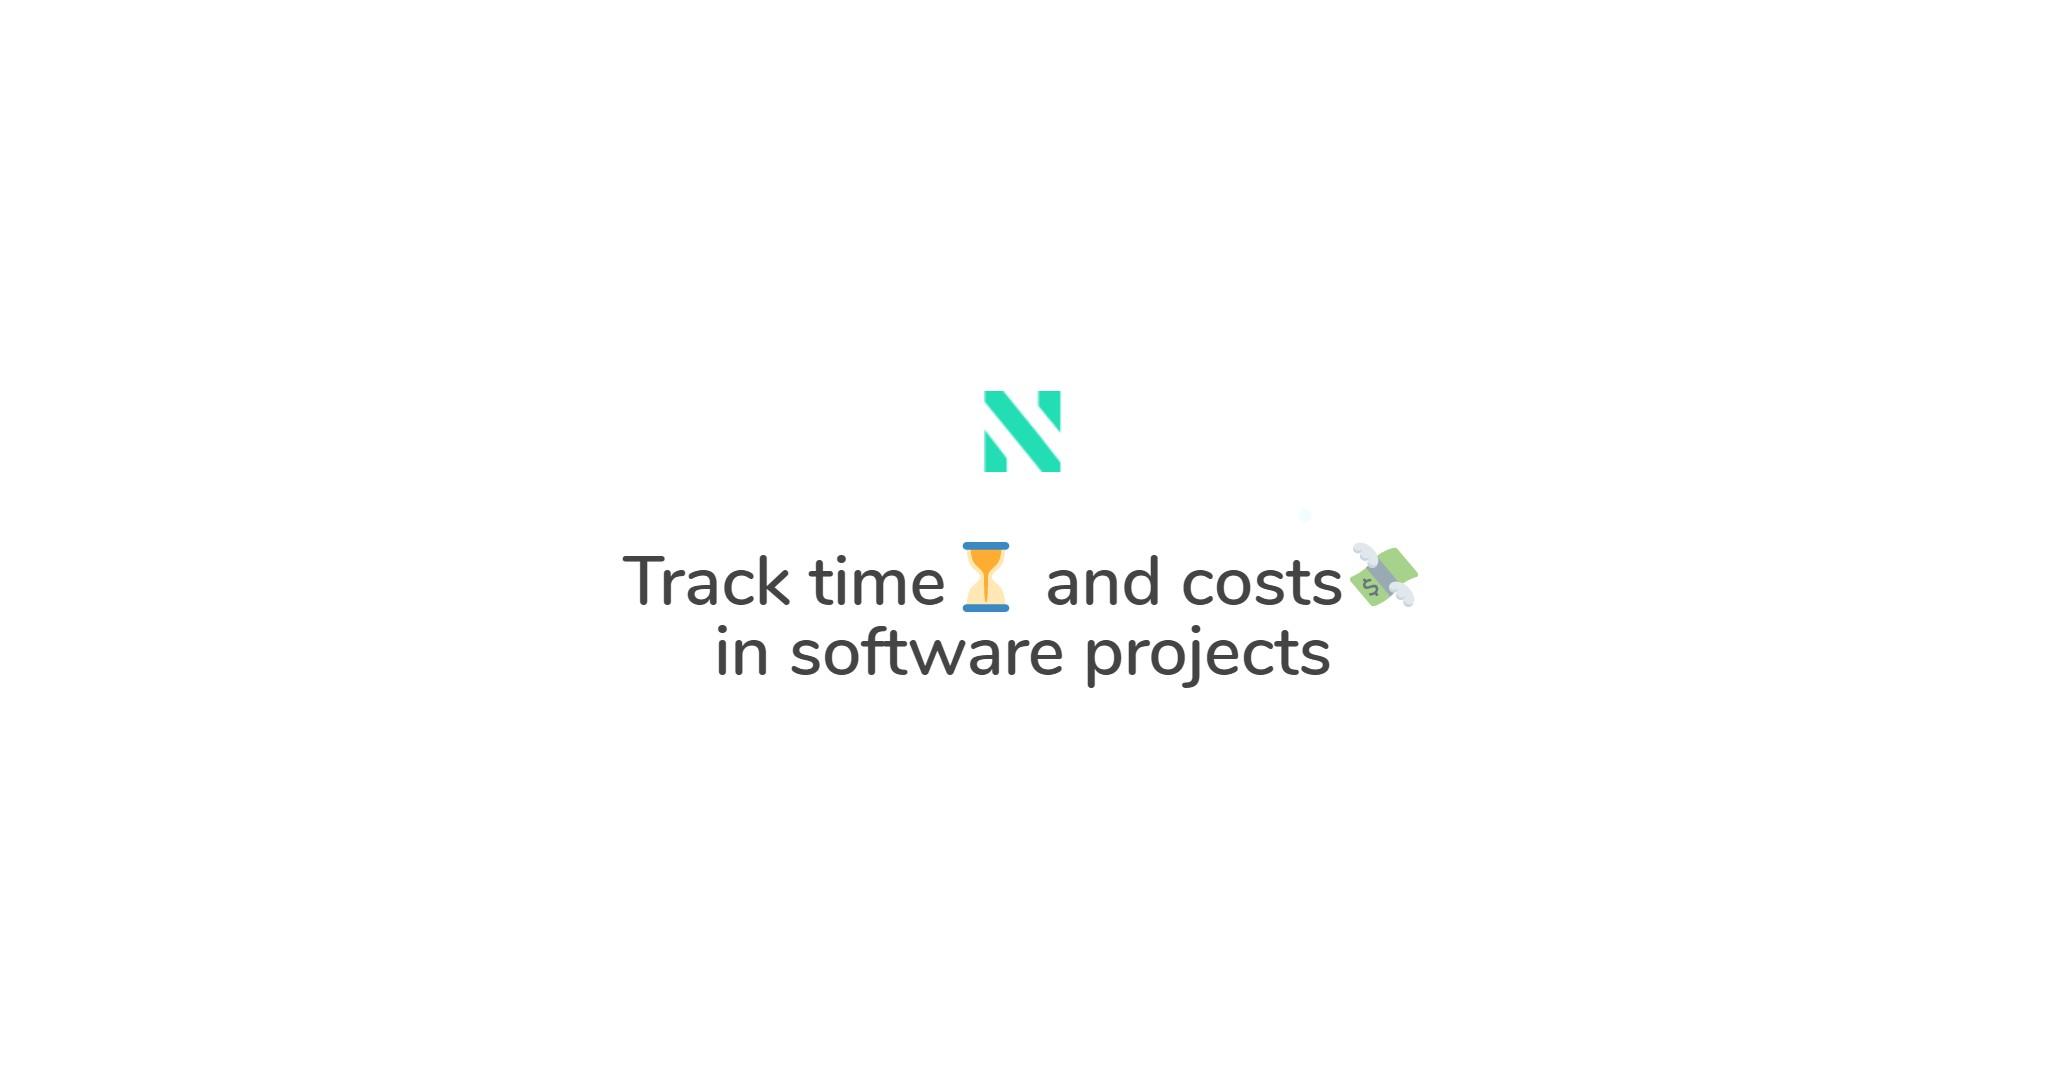 Sprint Cost